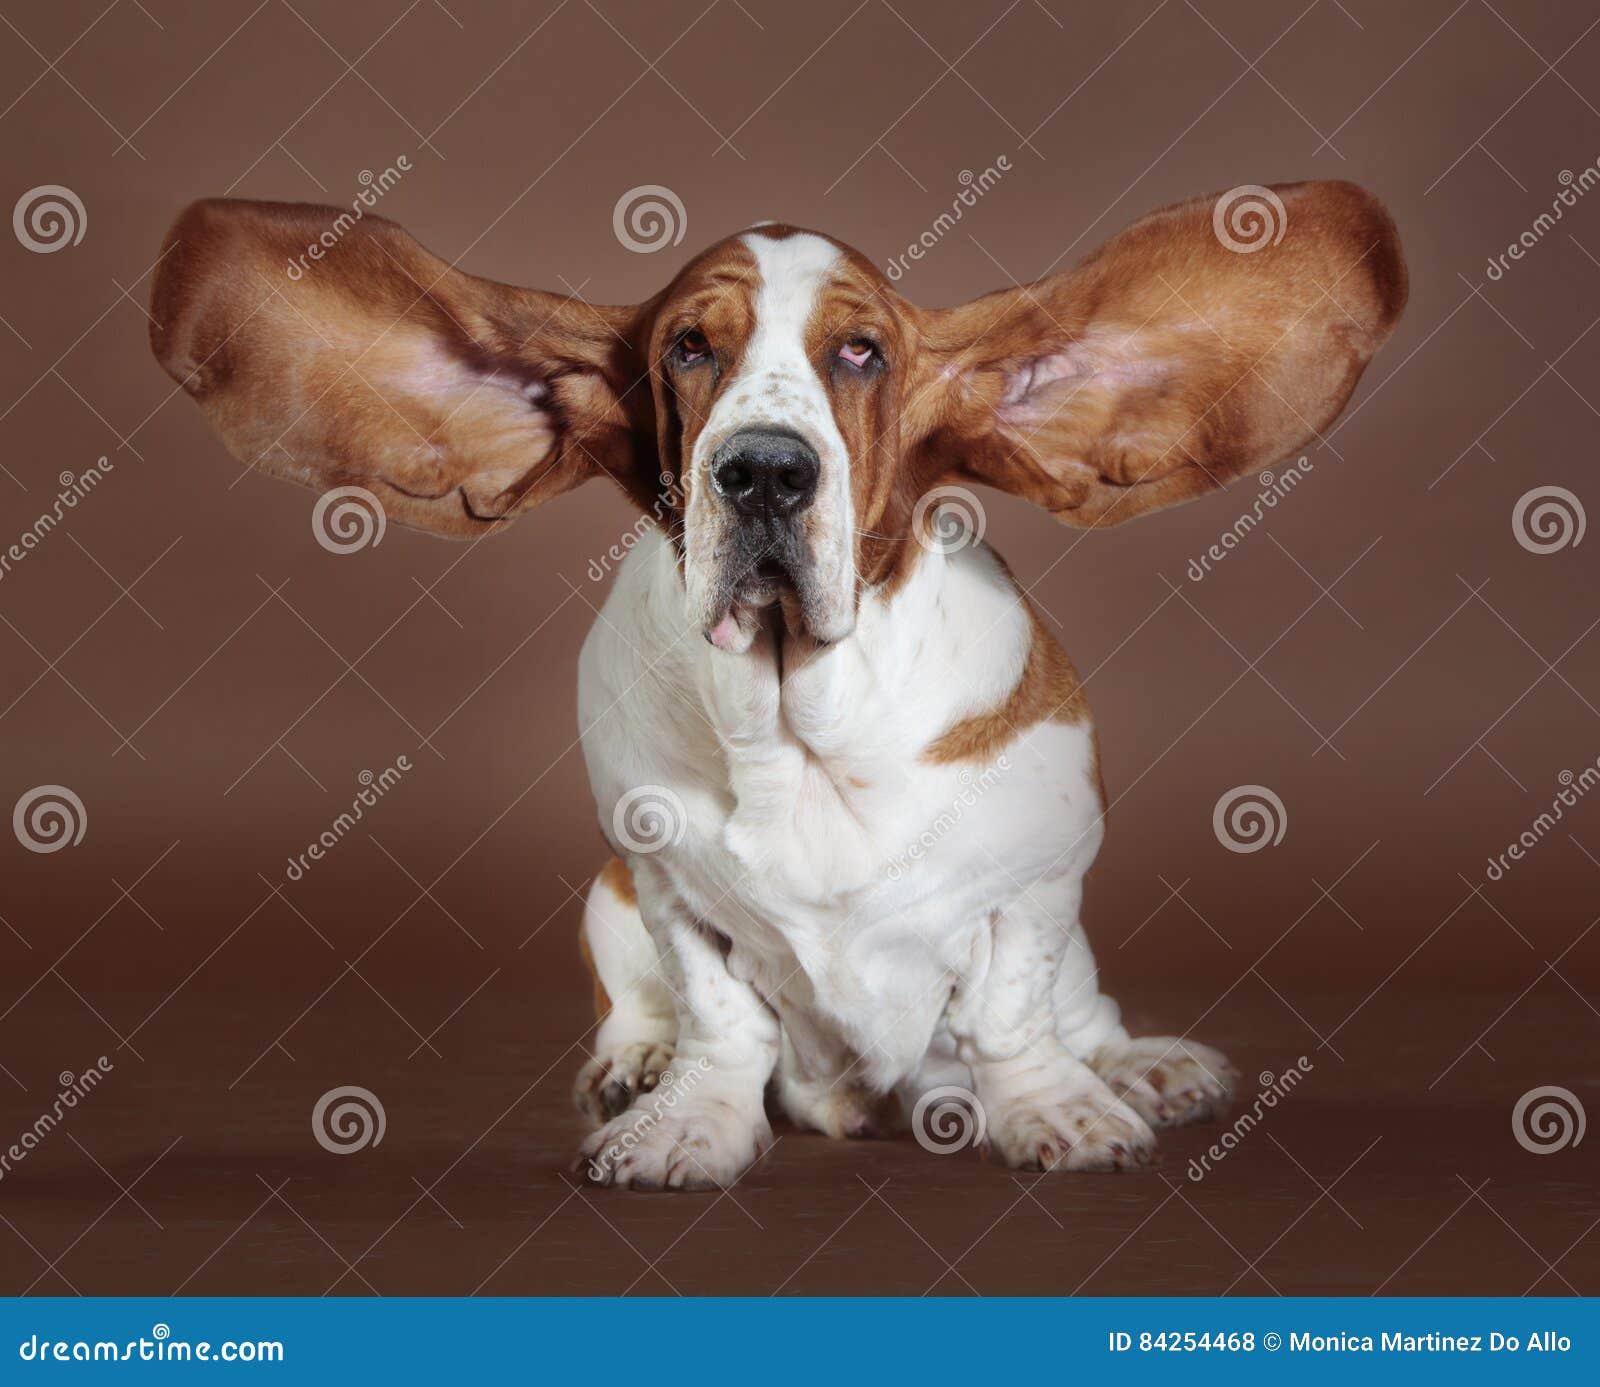 Basset hound ears stand